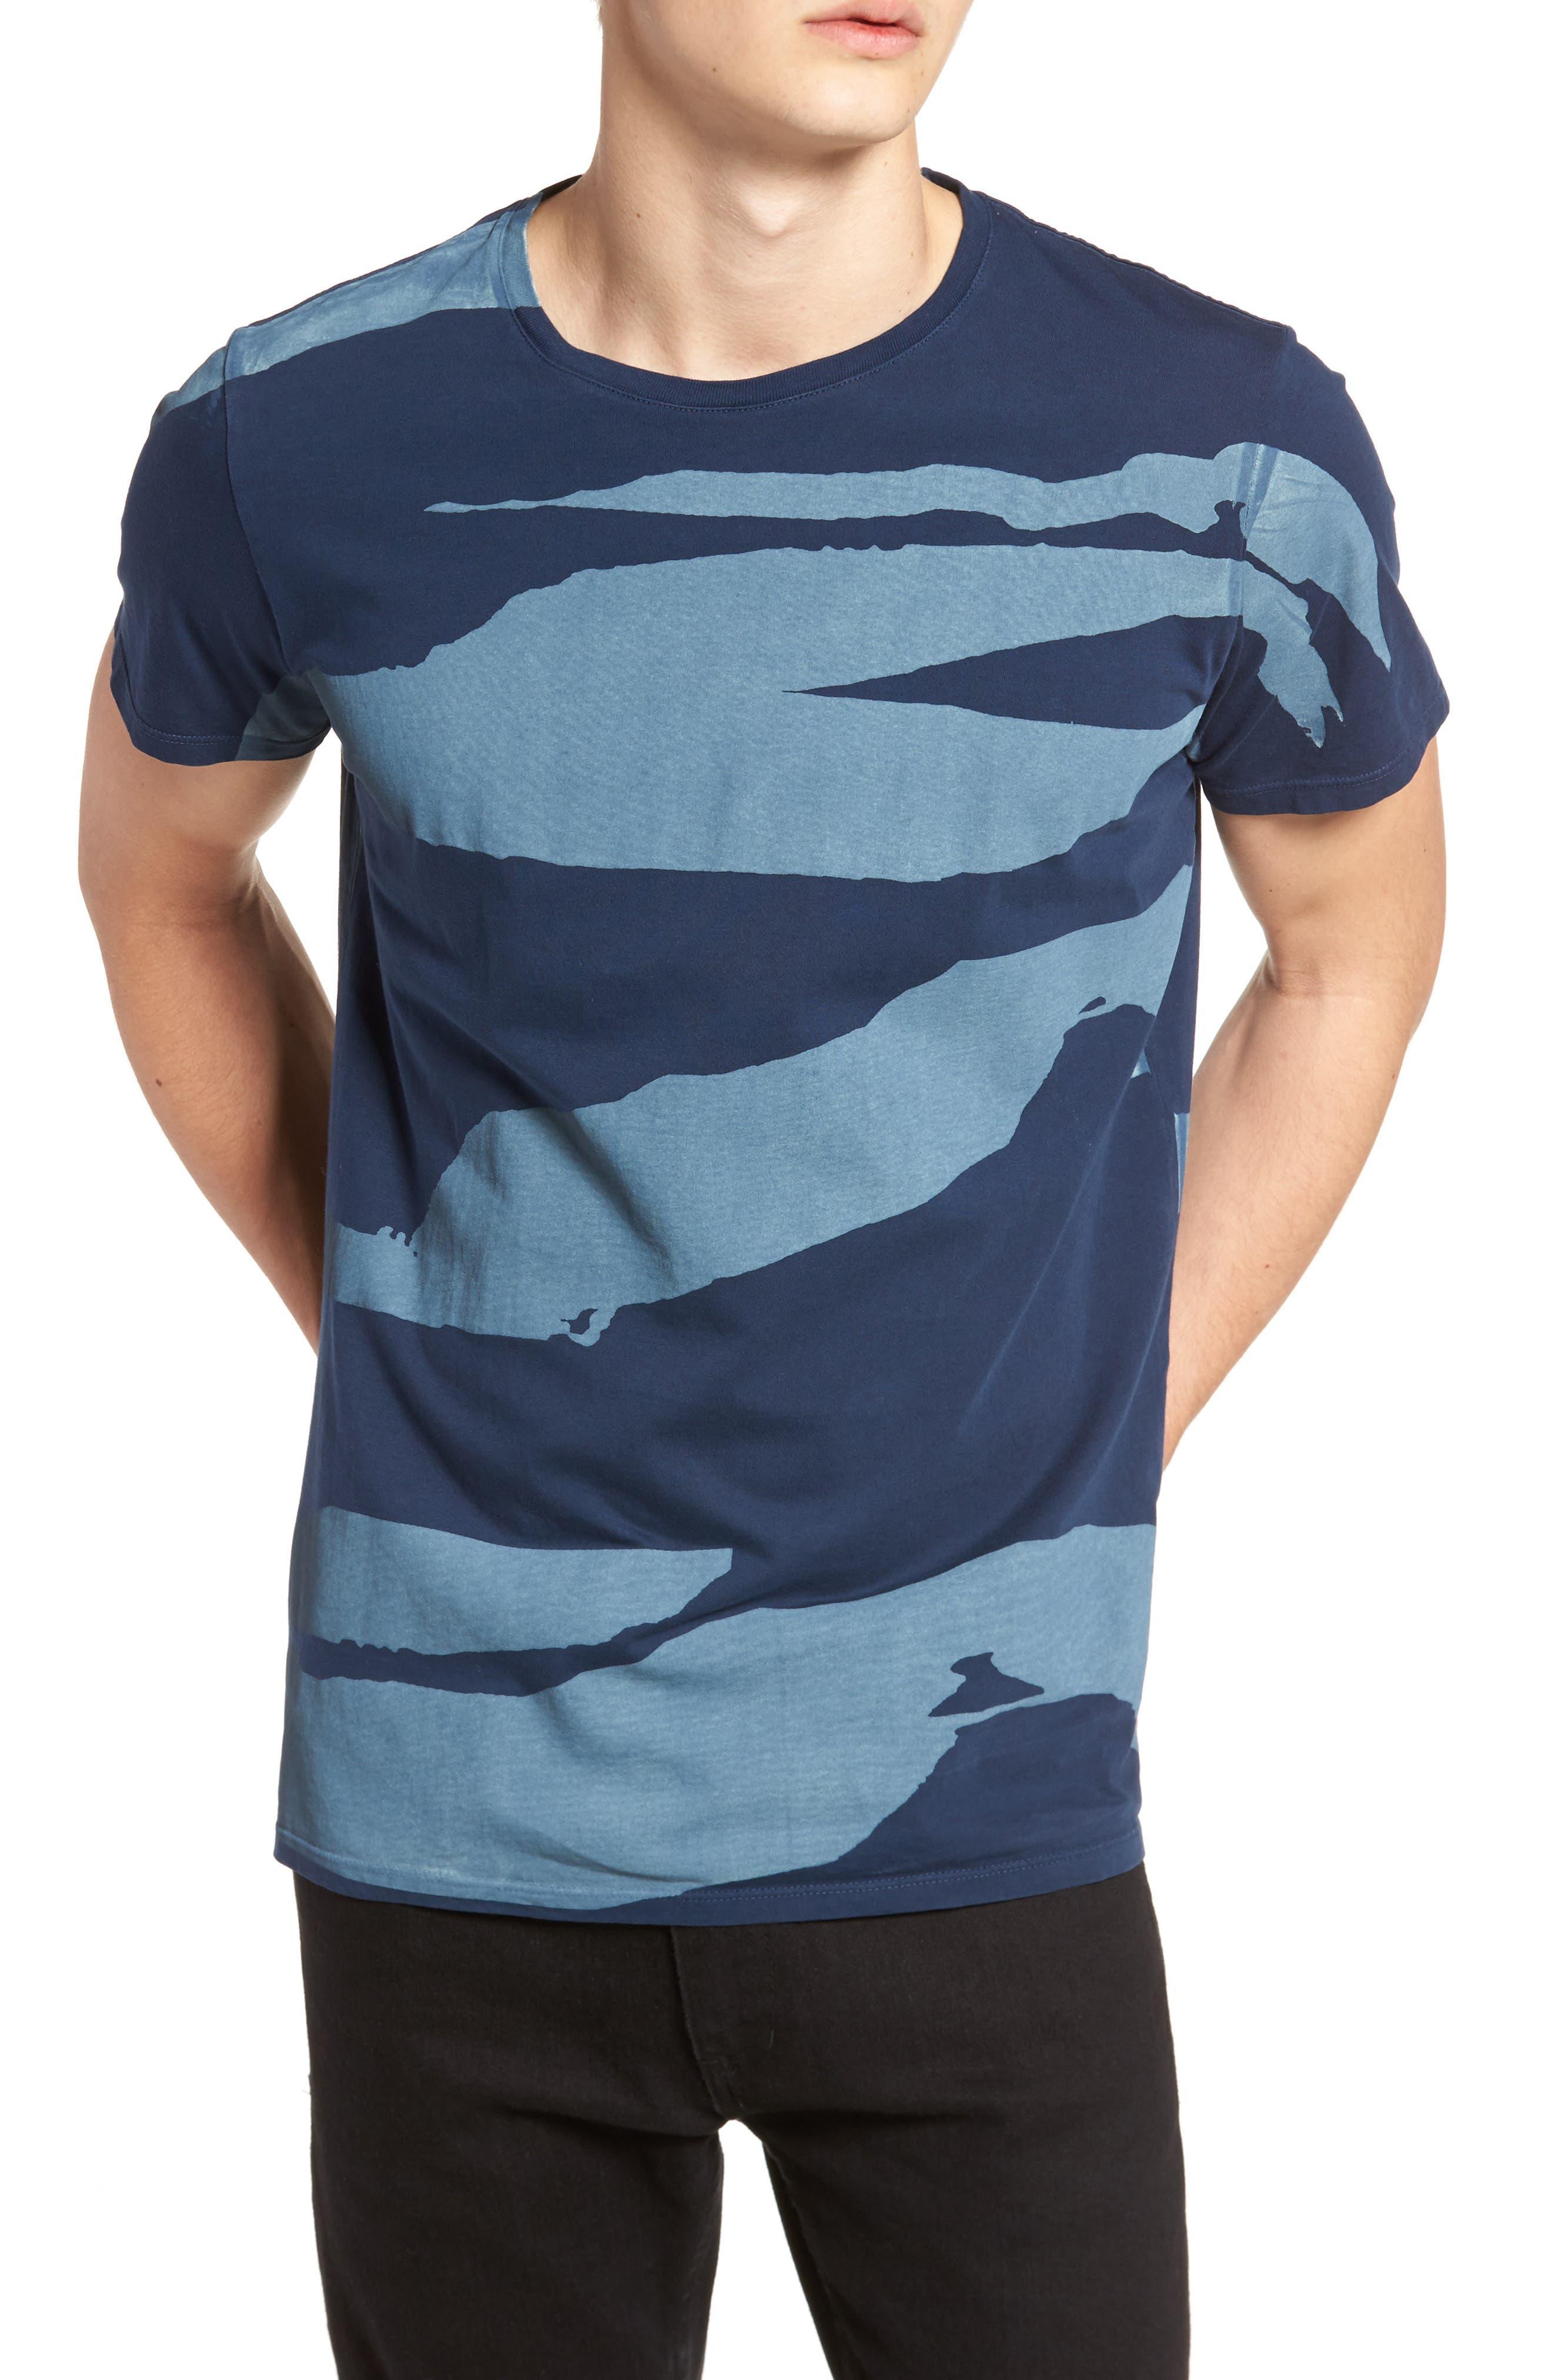 Torn Stripes T-Shirt,                             Main thumbnail 1, color,